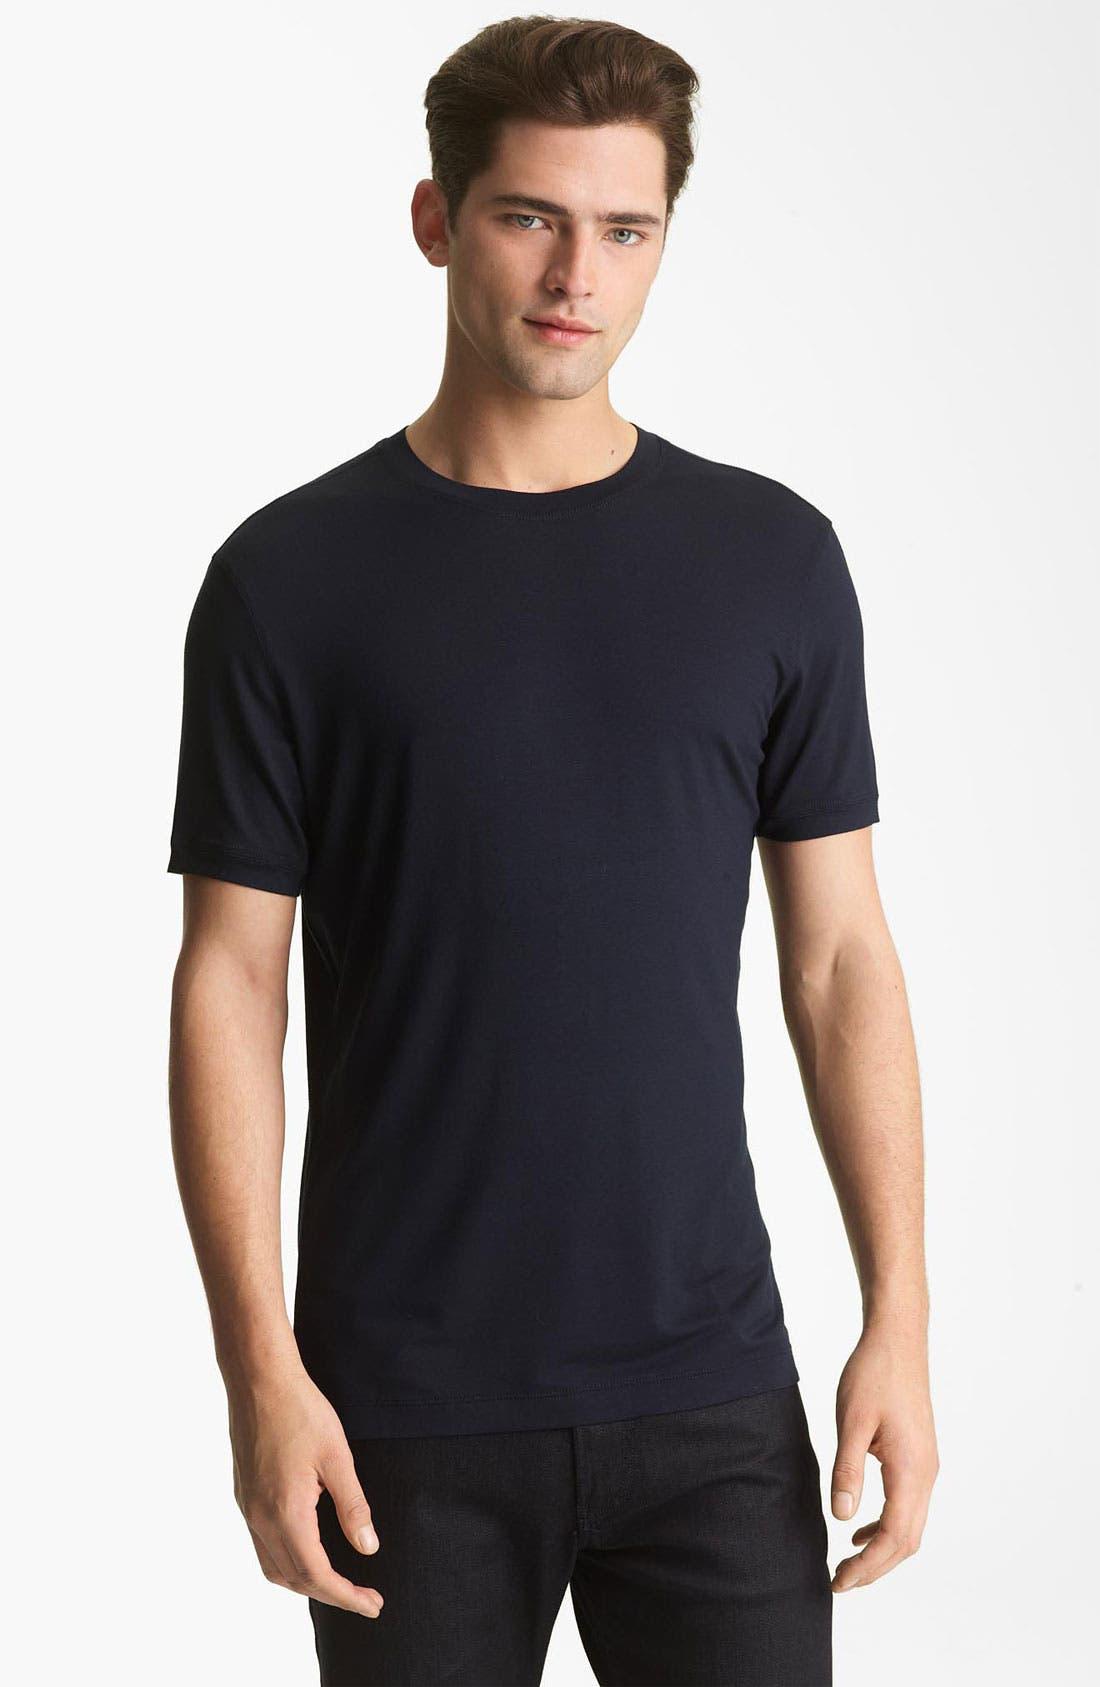 Alternate Image 1 Selected - Armani Collezioni Jersey Trim Fit T-Shirt